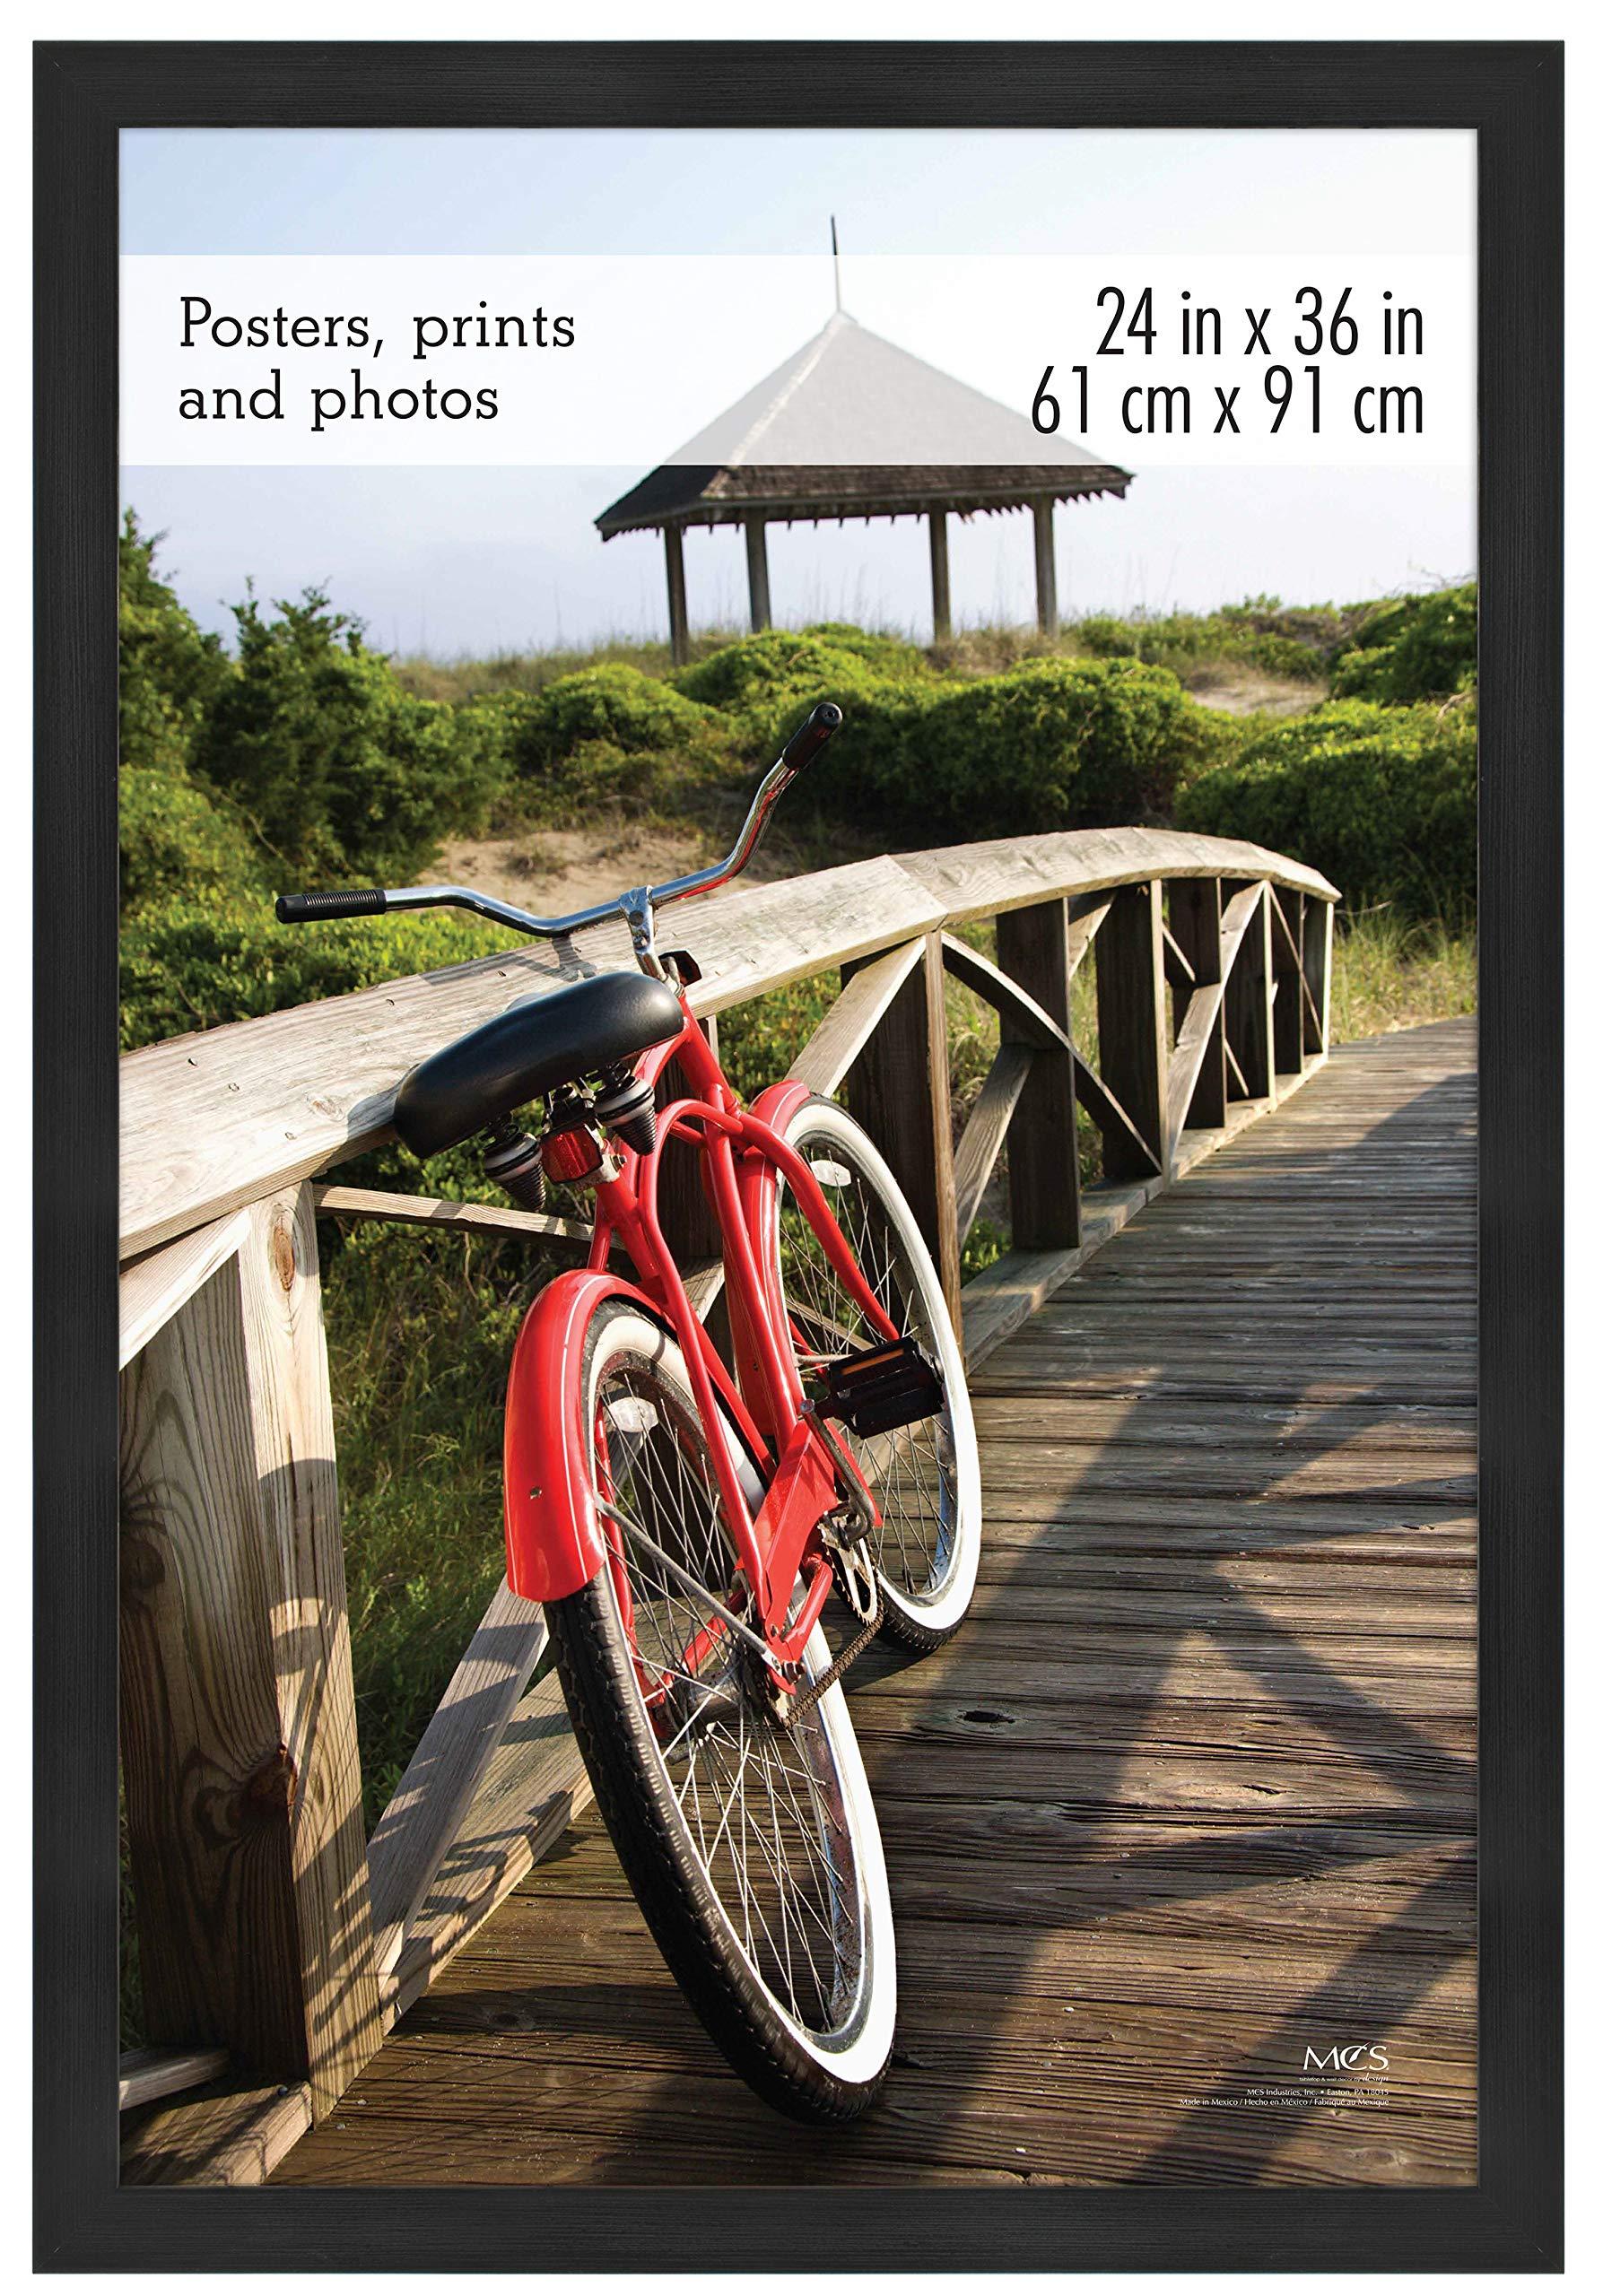 MCS 68859 Museum Poster Frame Onyx Woodgrain 24x36 Inch, 1 Frame by MCS Frames